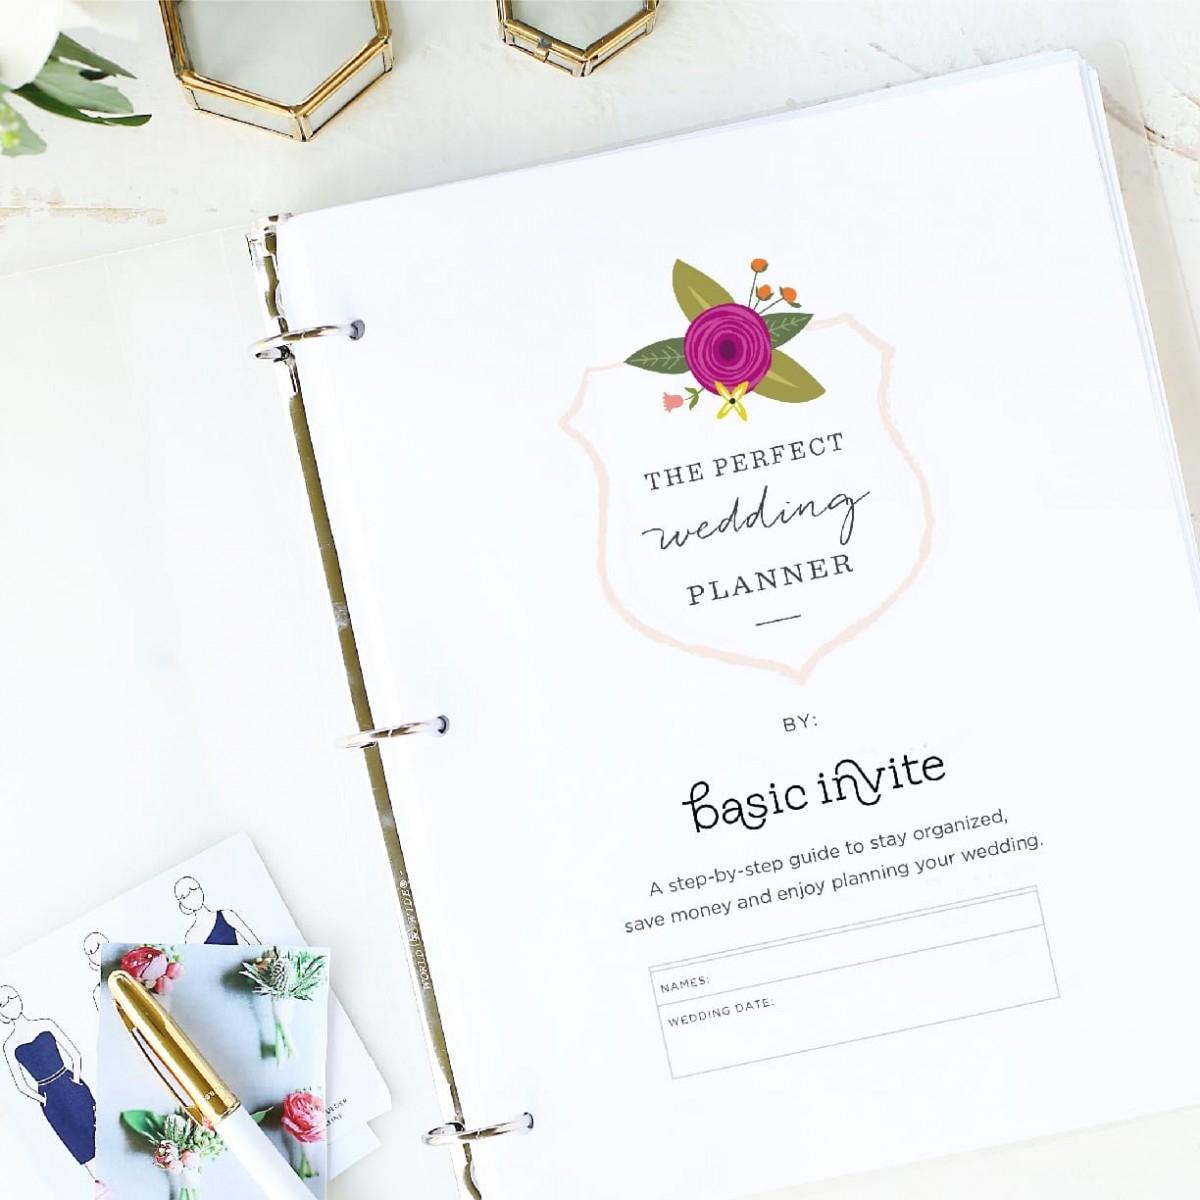 Wedding Planner Printablebasic Invite - Free Printable Wedding Planner